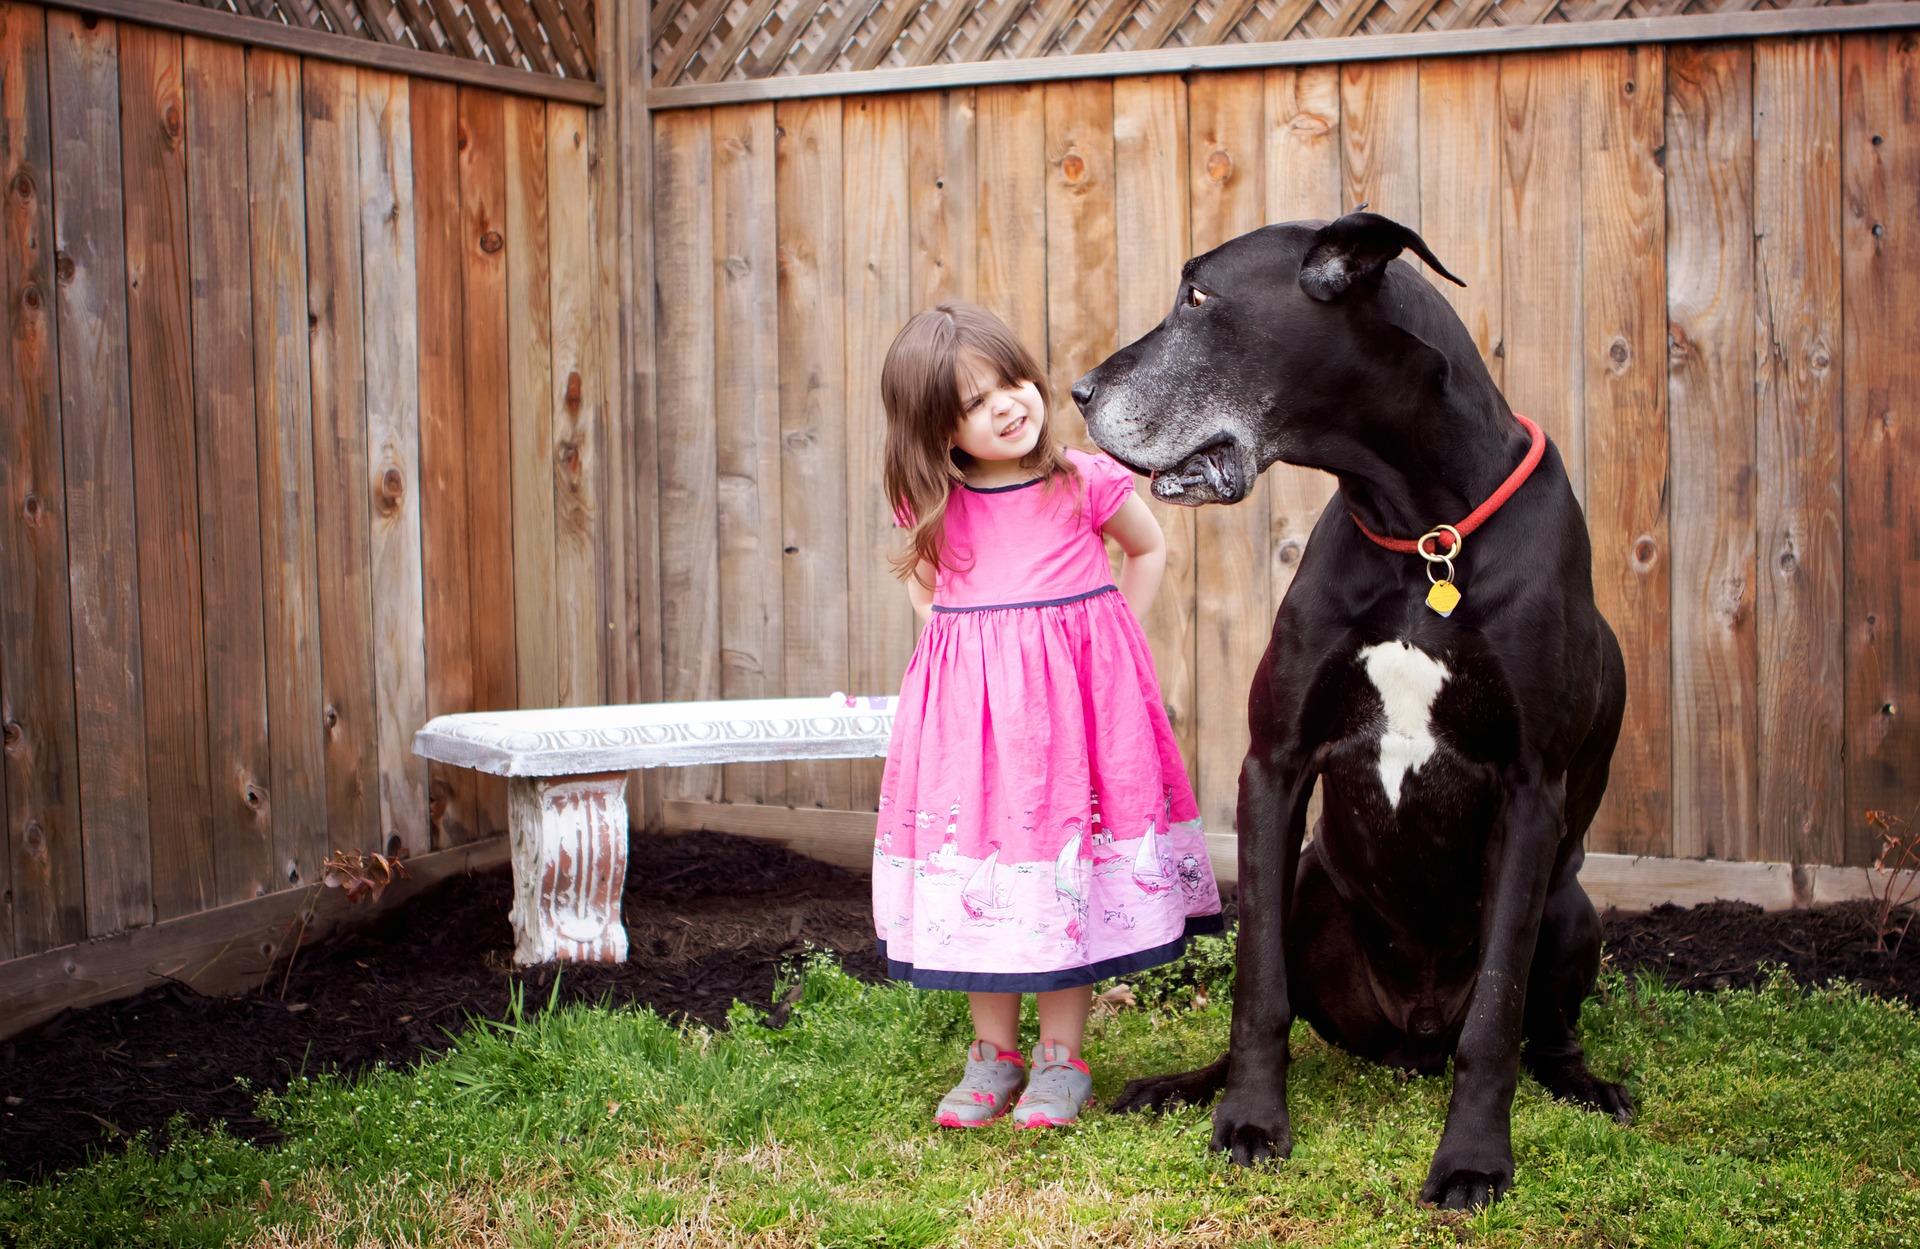 Large Dog and Small Girl